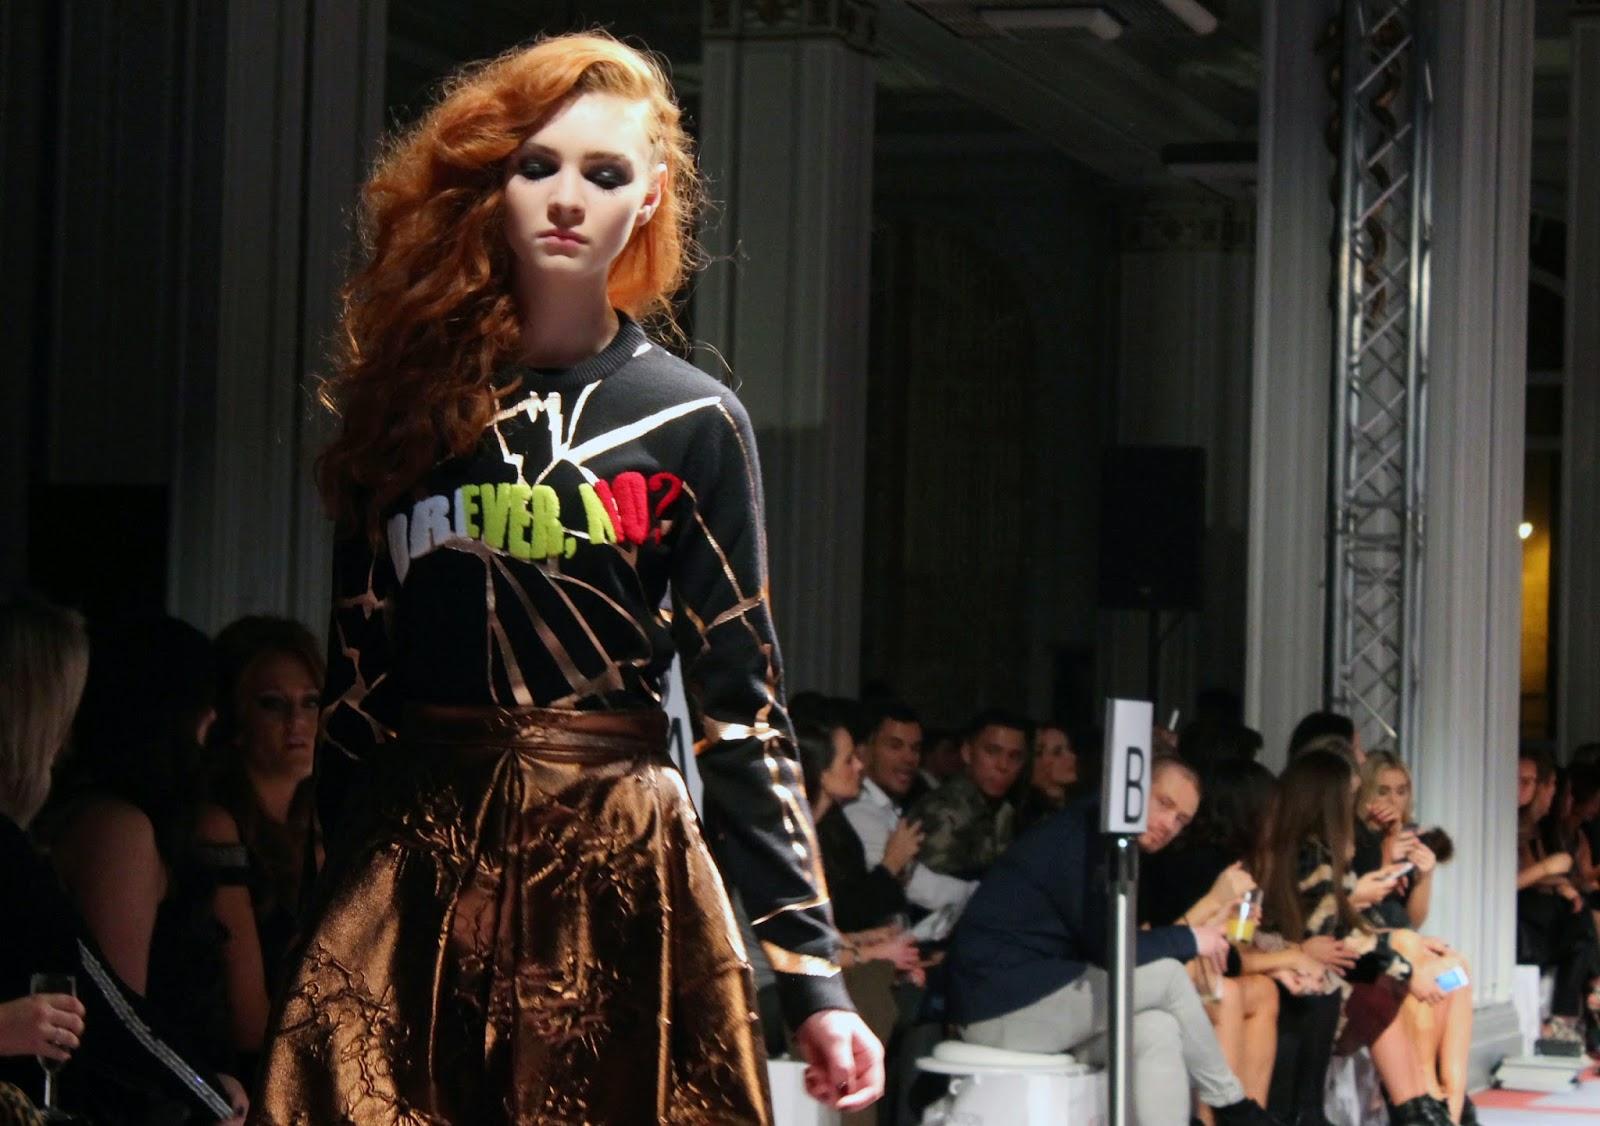 kenzo forever, no? sweatshirt at cricket fashion show liverpool celebration of style